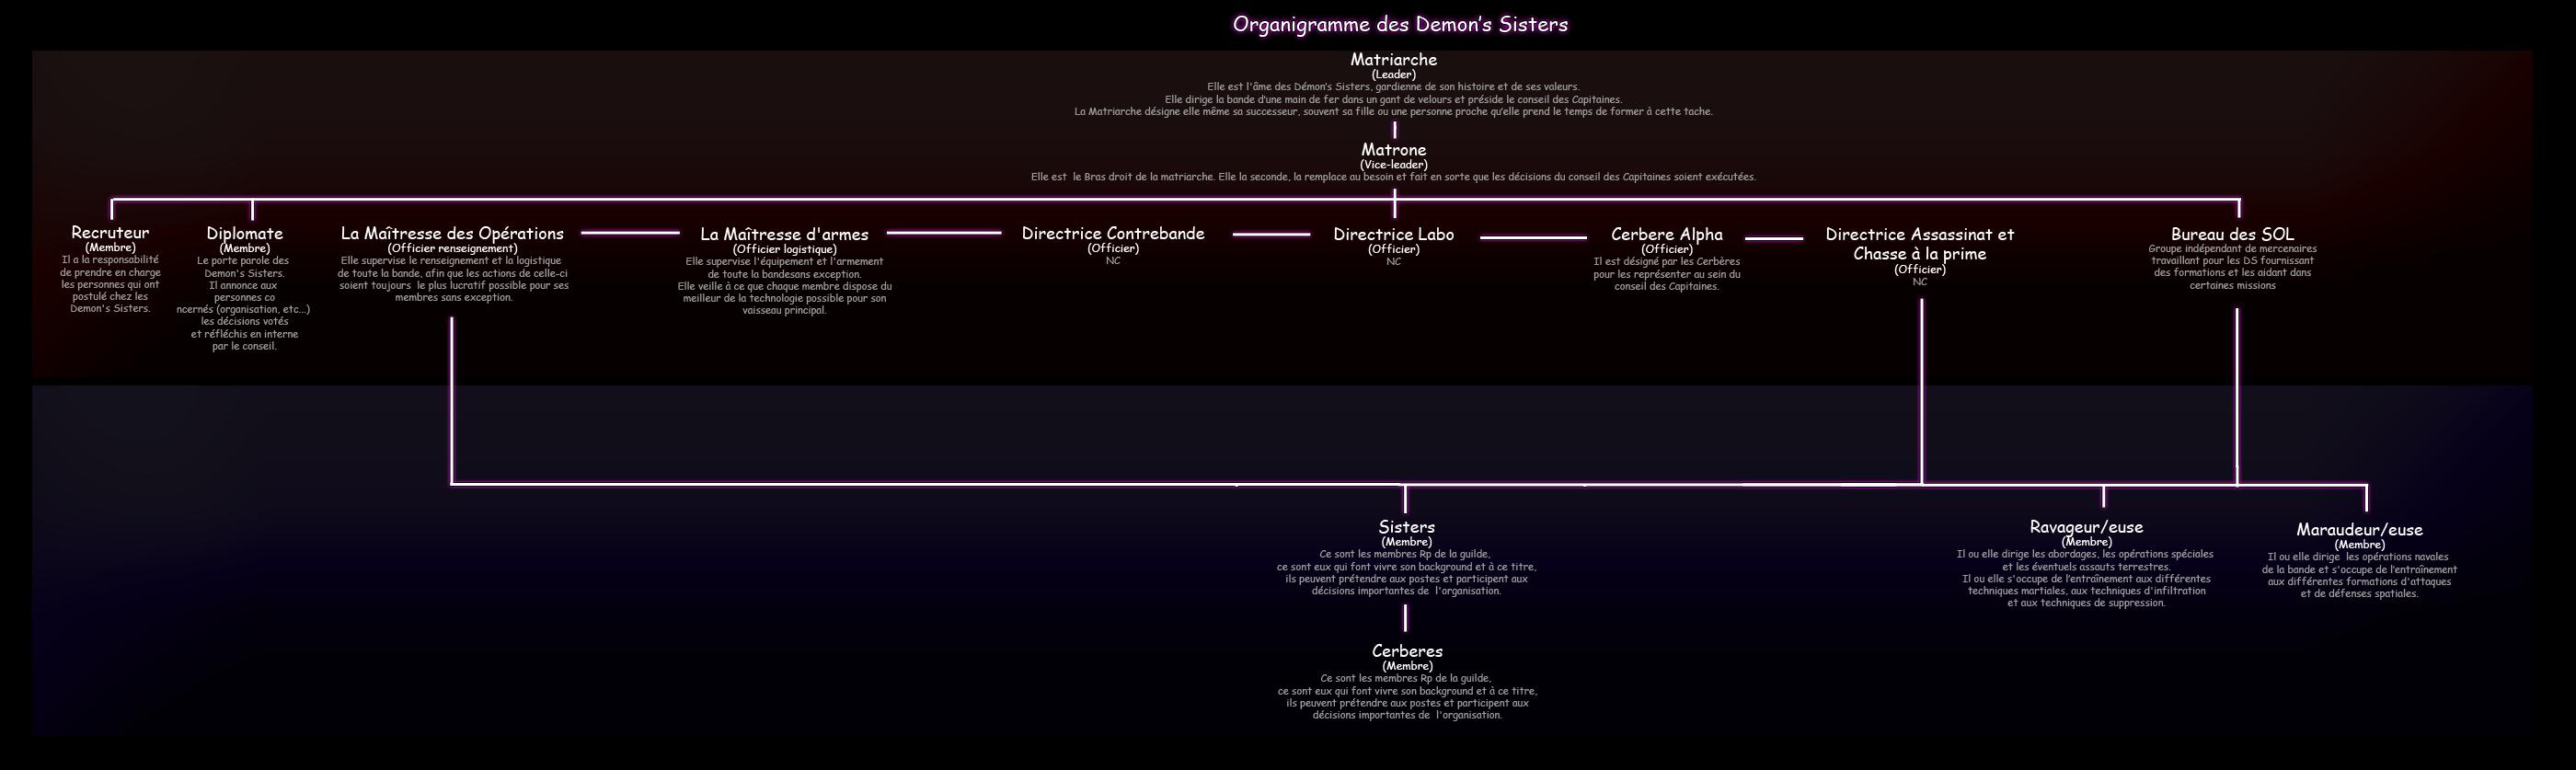 Organigramme  Organi12